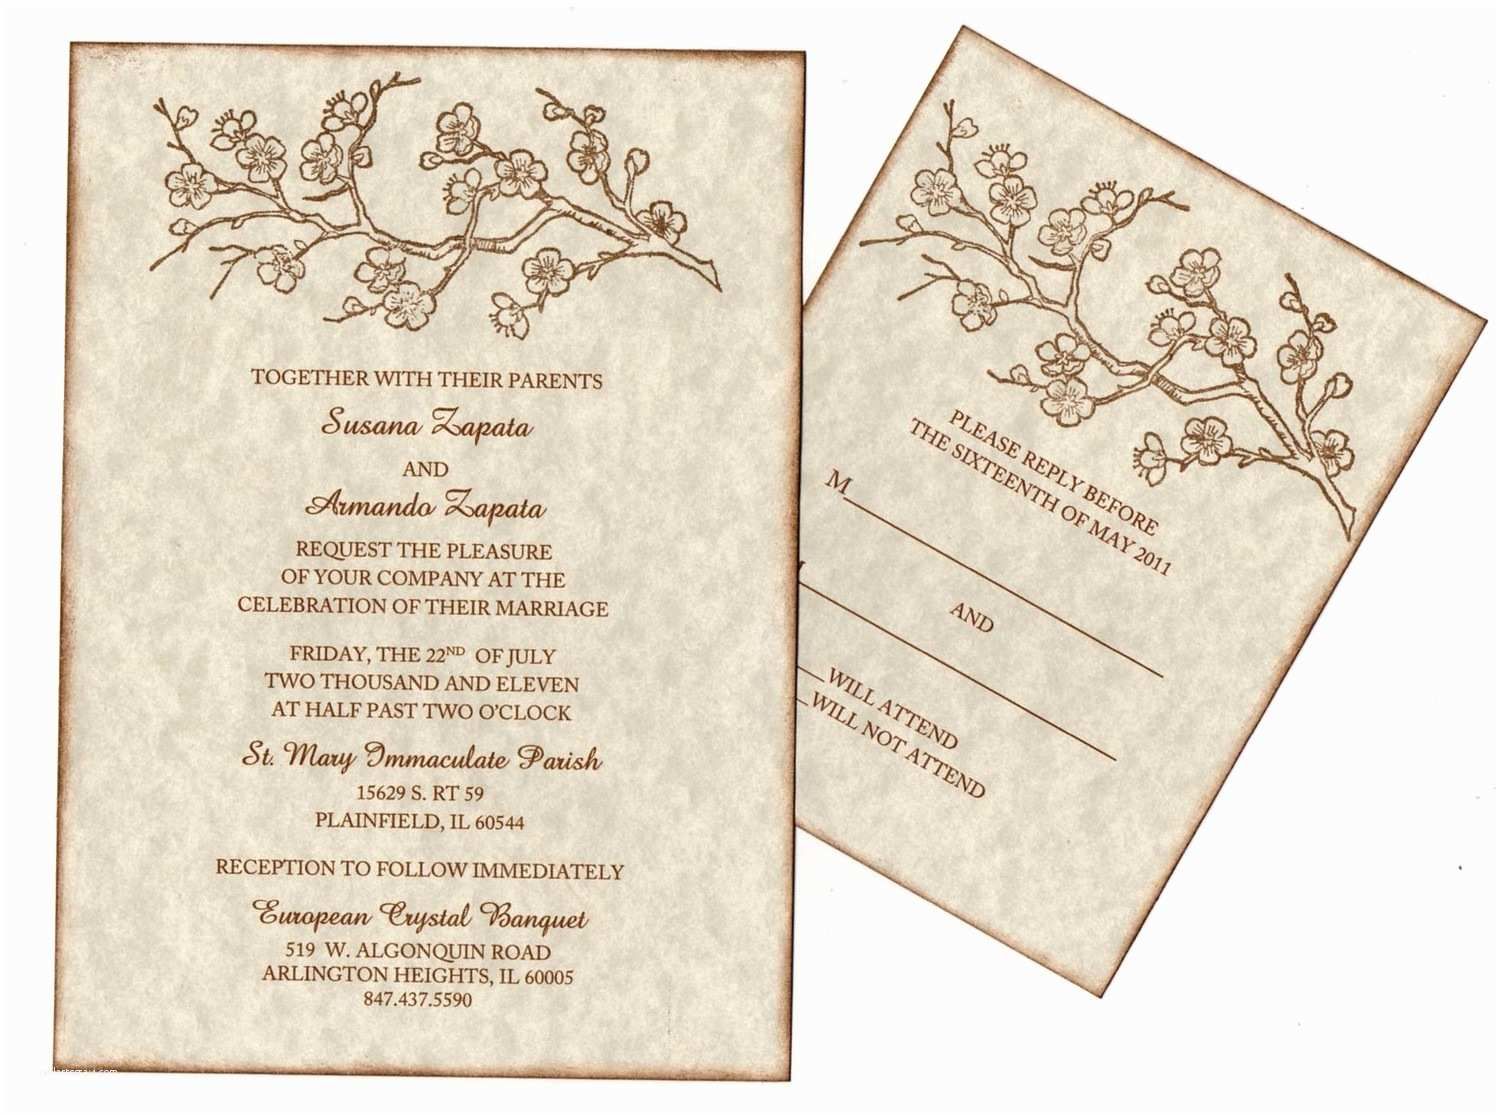 Wedding Invitation Designs south Indian Wedding Invitation Cards Designs Yourweek